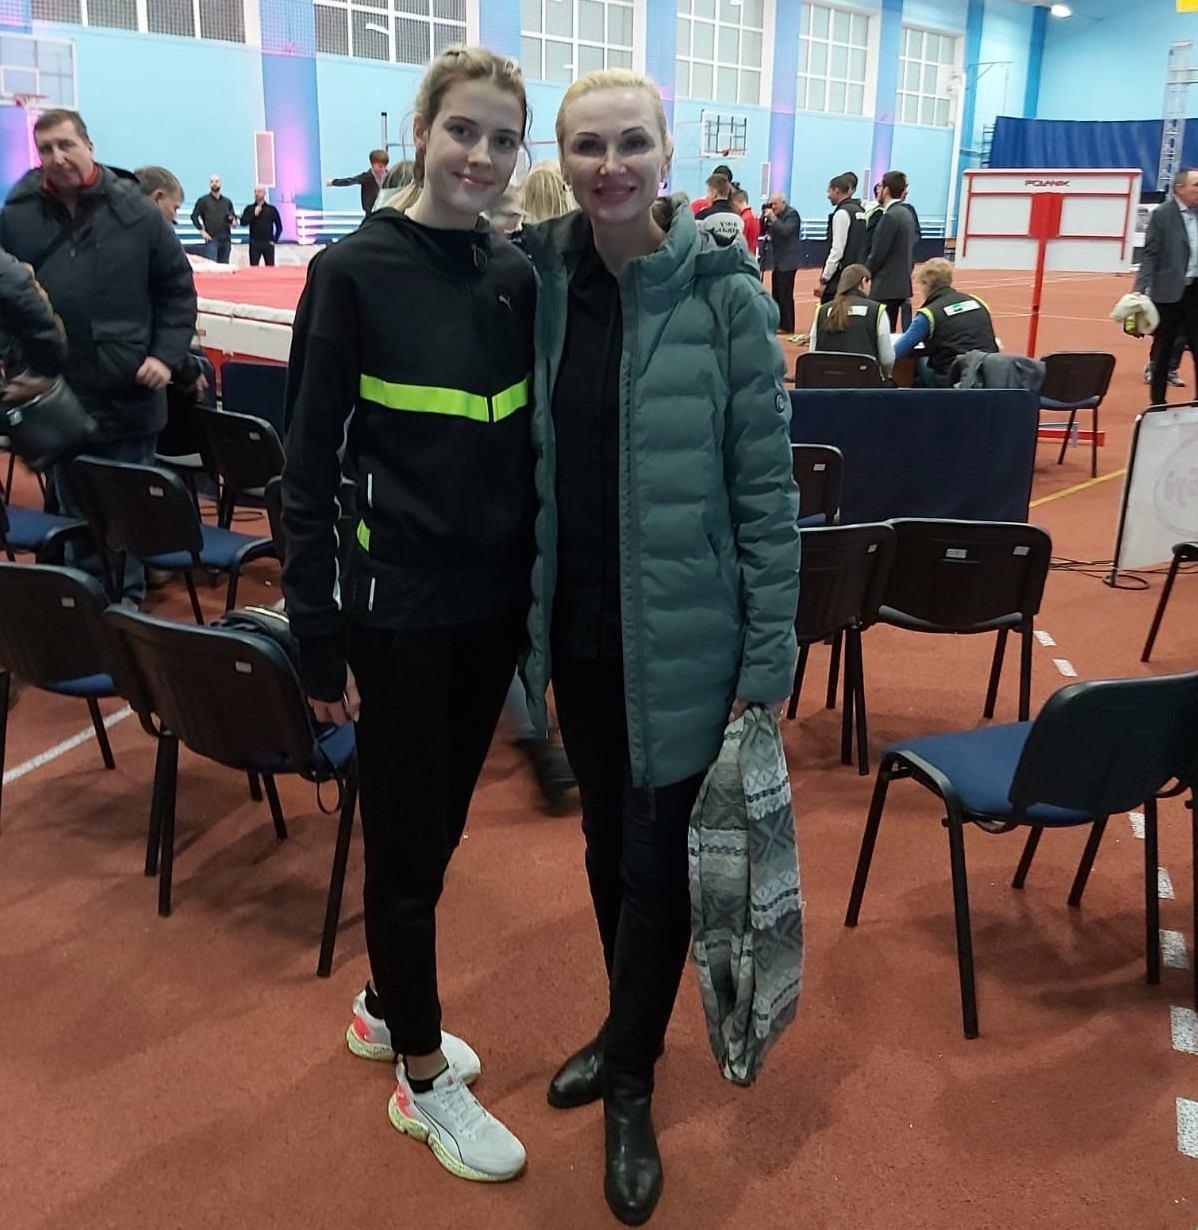 Inga Babakova und Yaroslava Mahuchikh